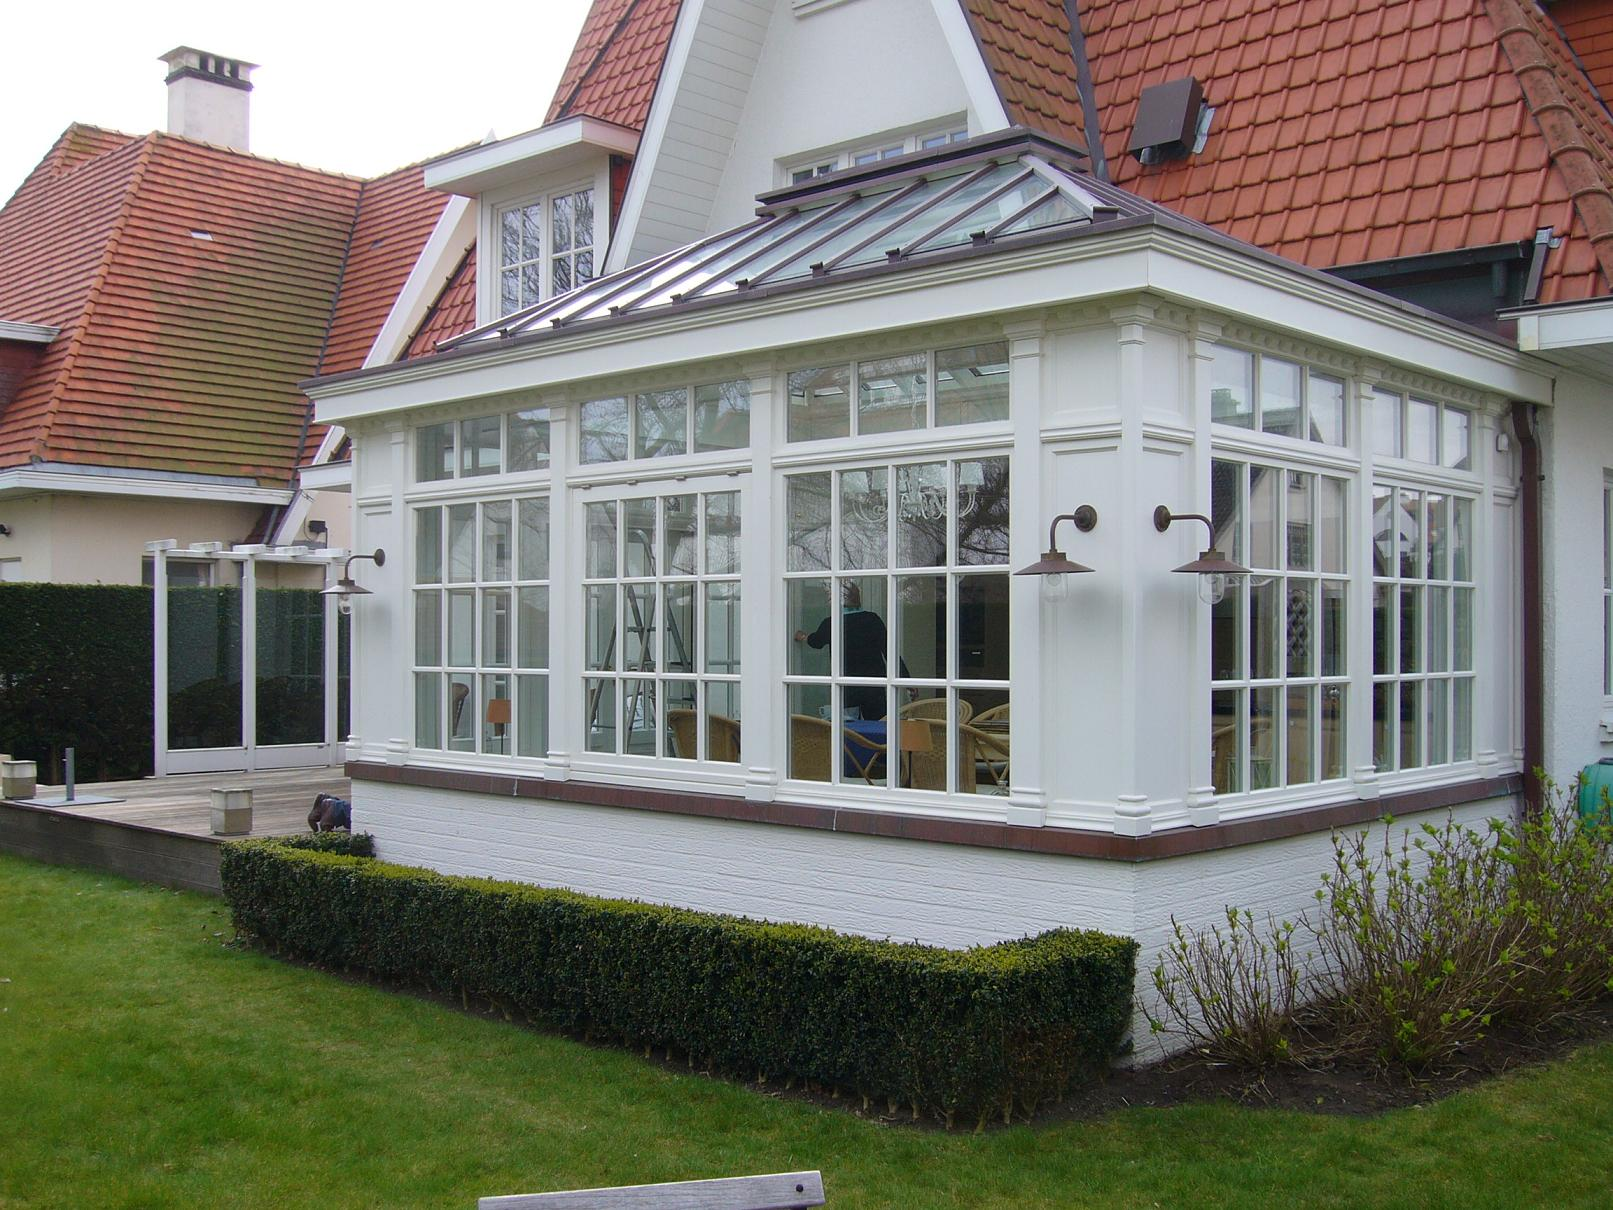 Orangerie Wintergarten orangerie in belgien jc exklusive wintergärten klassische